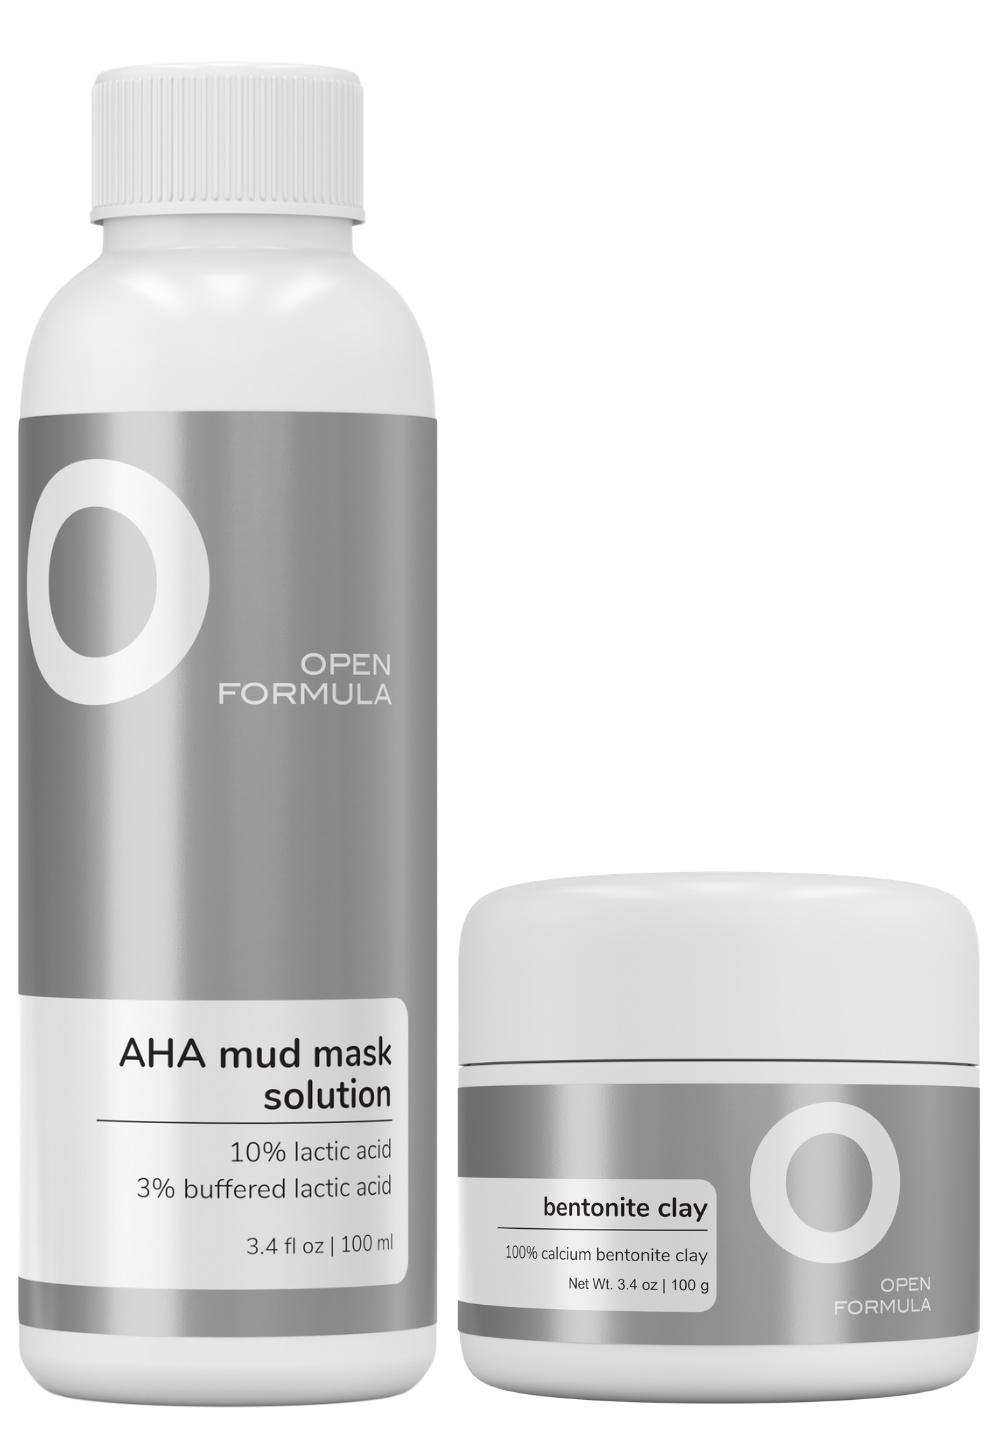 Open Formula Bentonite Clay Mask (100% Bentonite Clay) + 13% AHA Solution